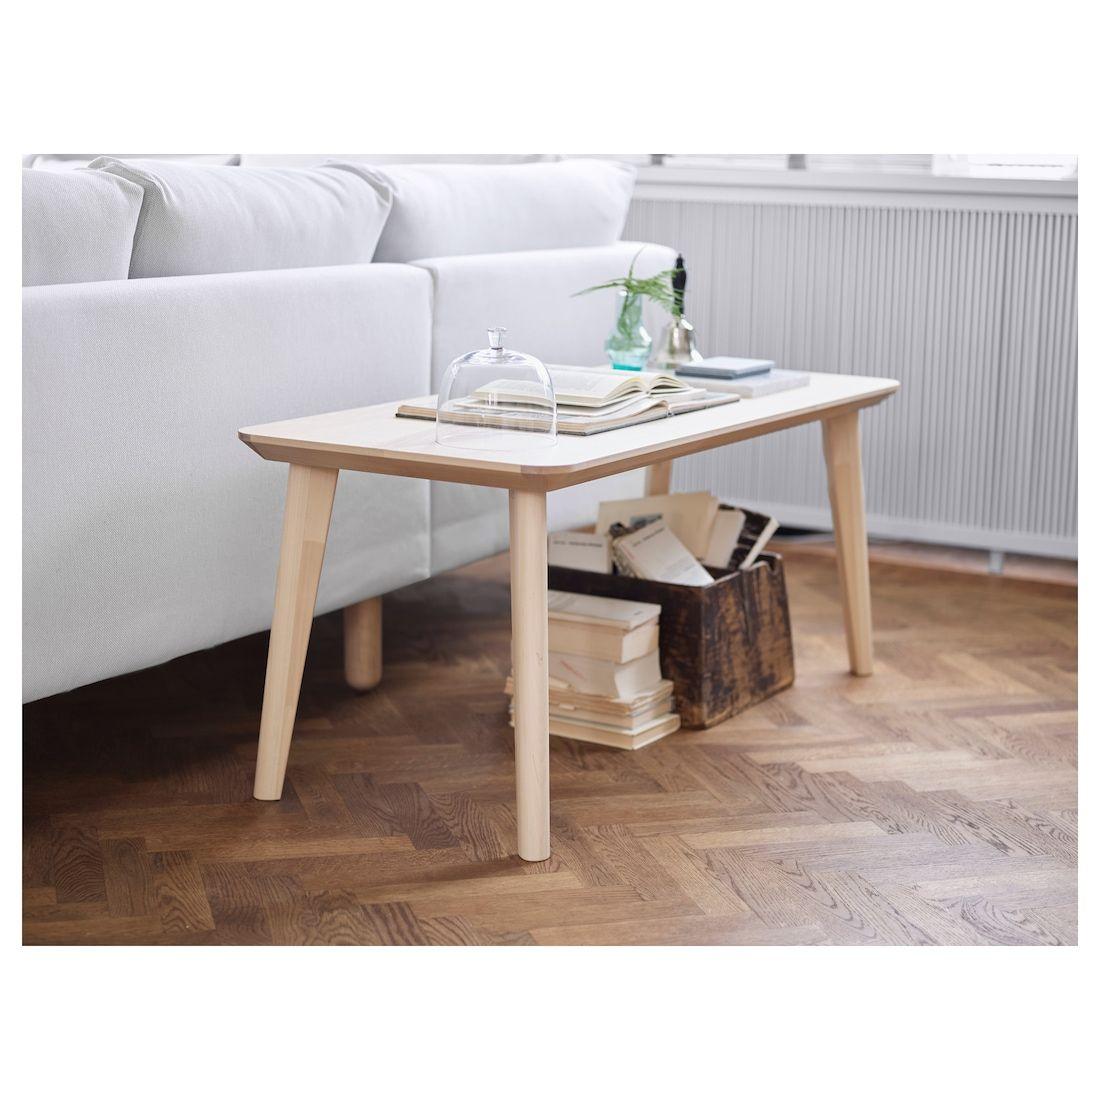 Lisabo Coffee Table Ash Veneer 46 1 2x19 5 8 Ikea Coffee Table Living Room Table Coffee Table Wood [ 1100 x 1100 Pixel ]